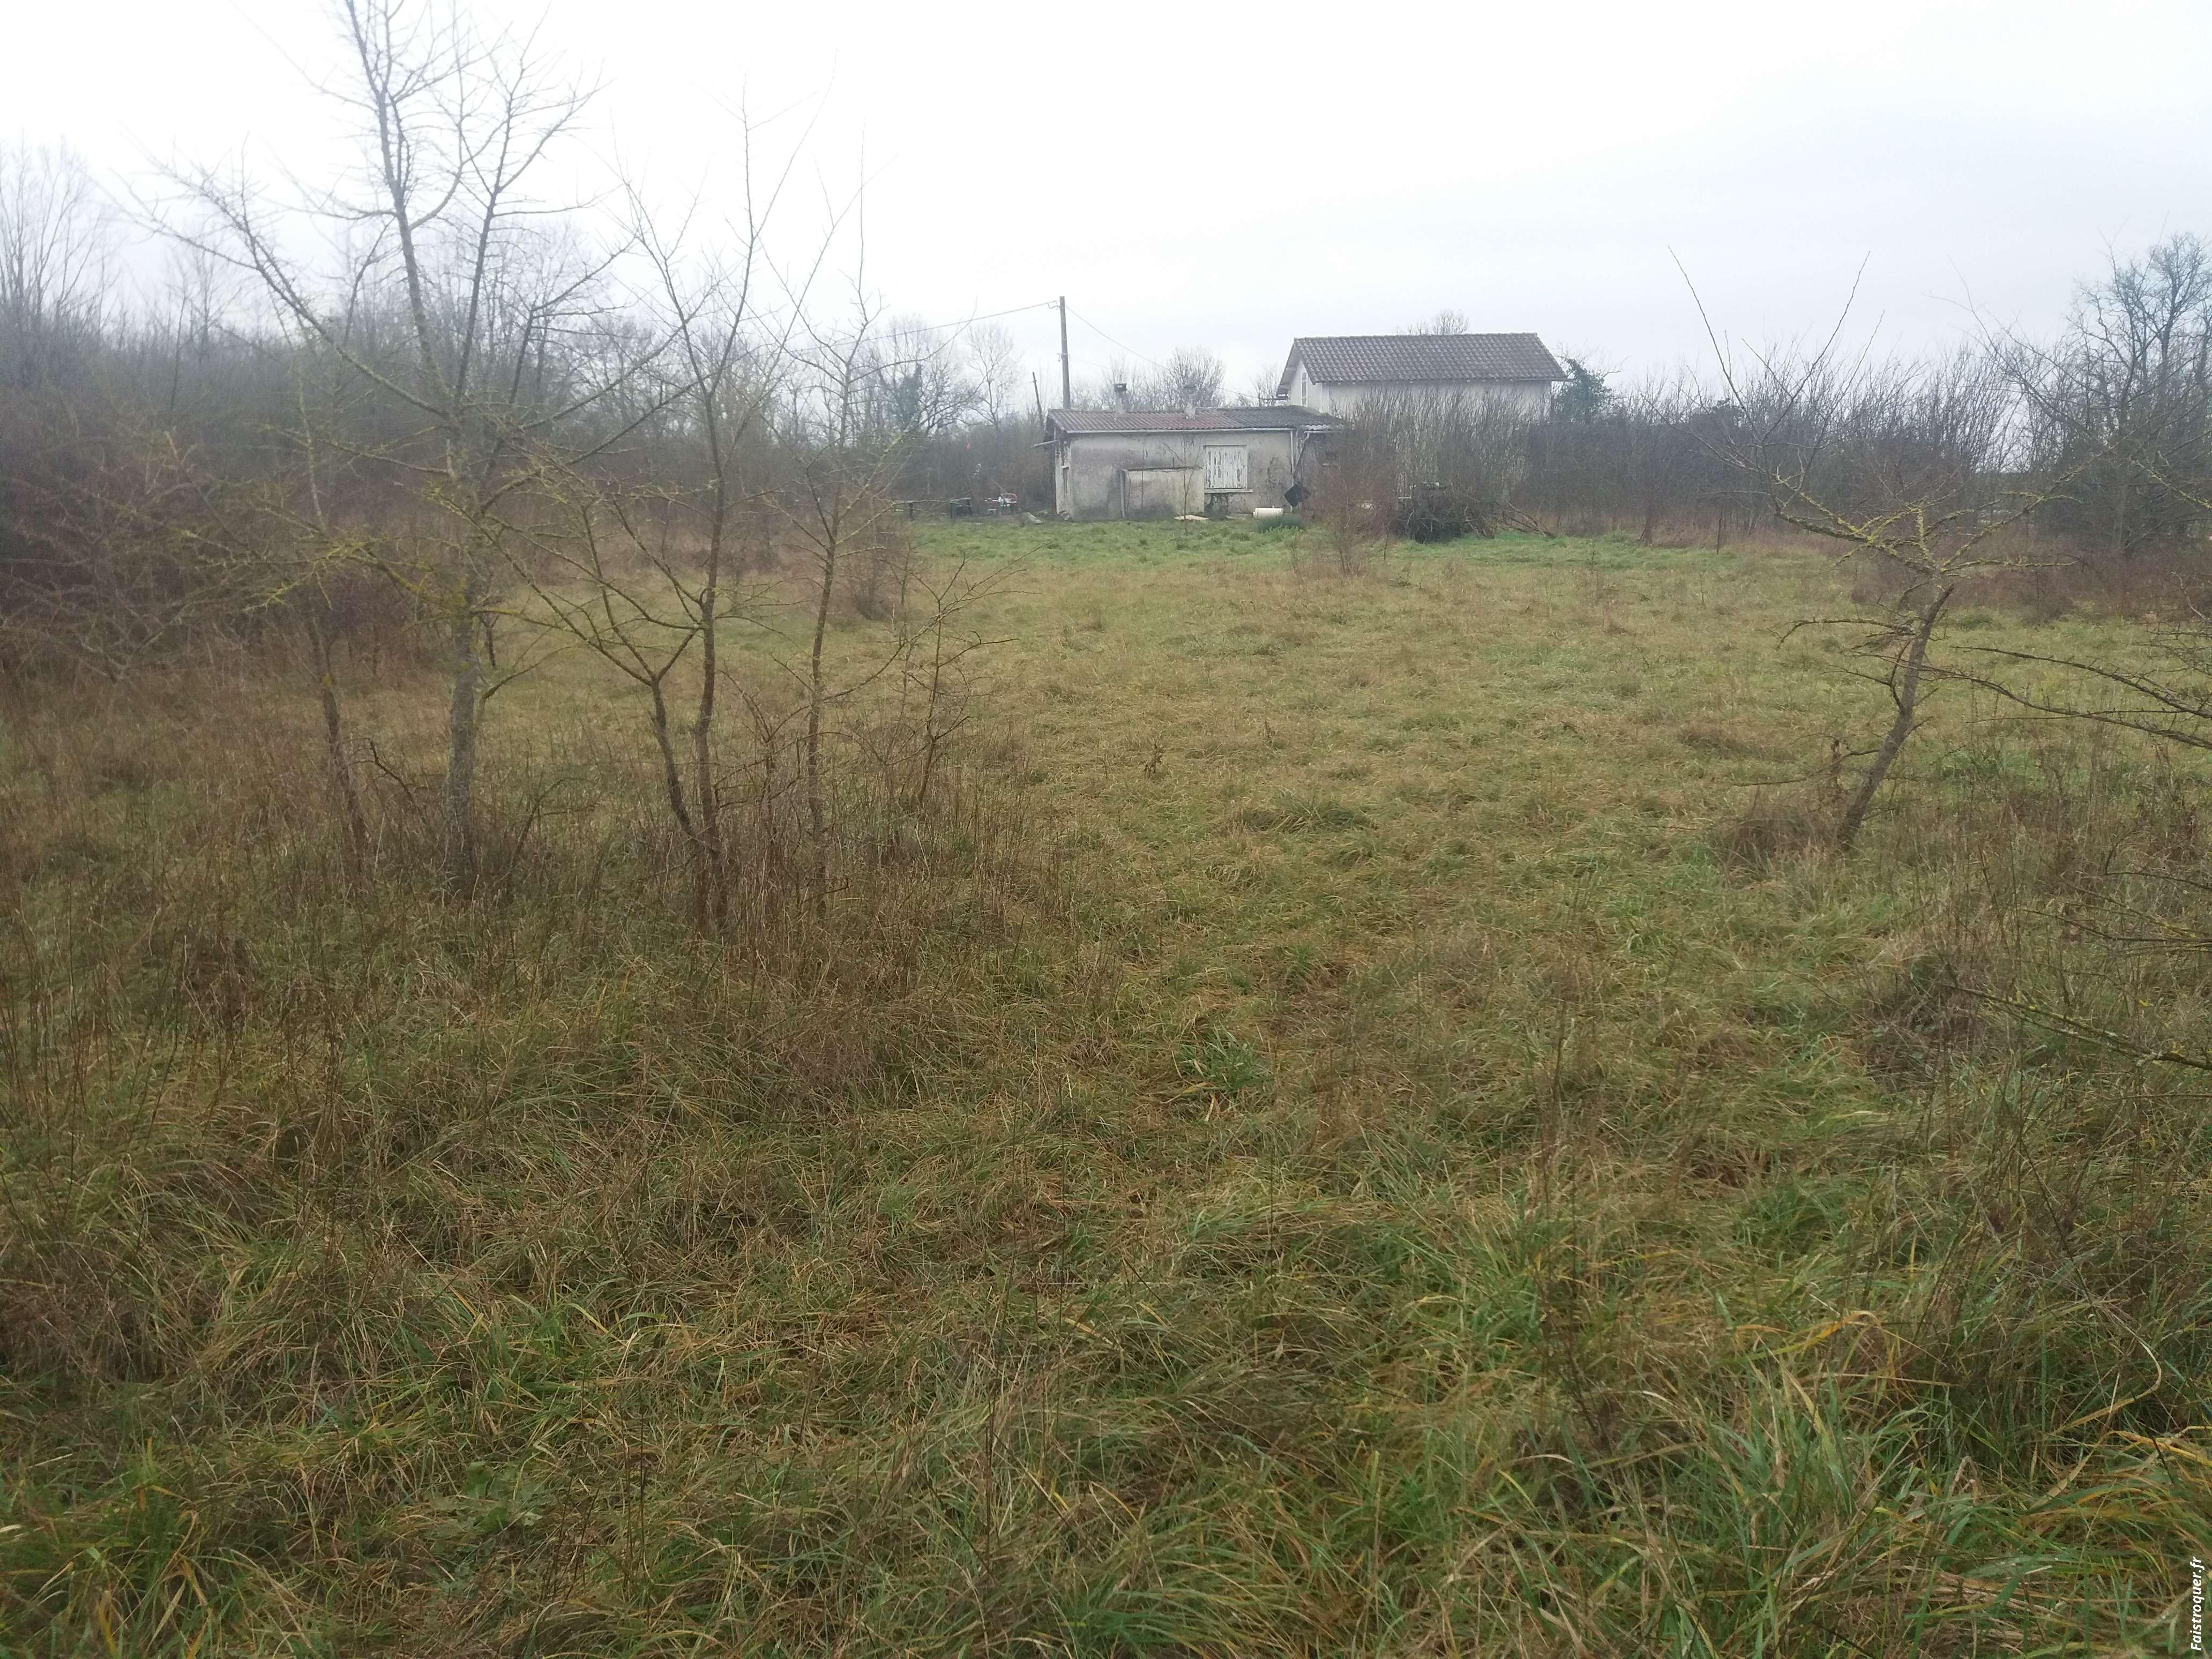 A saisir maison grand terrain sans voisinage